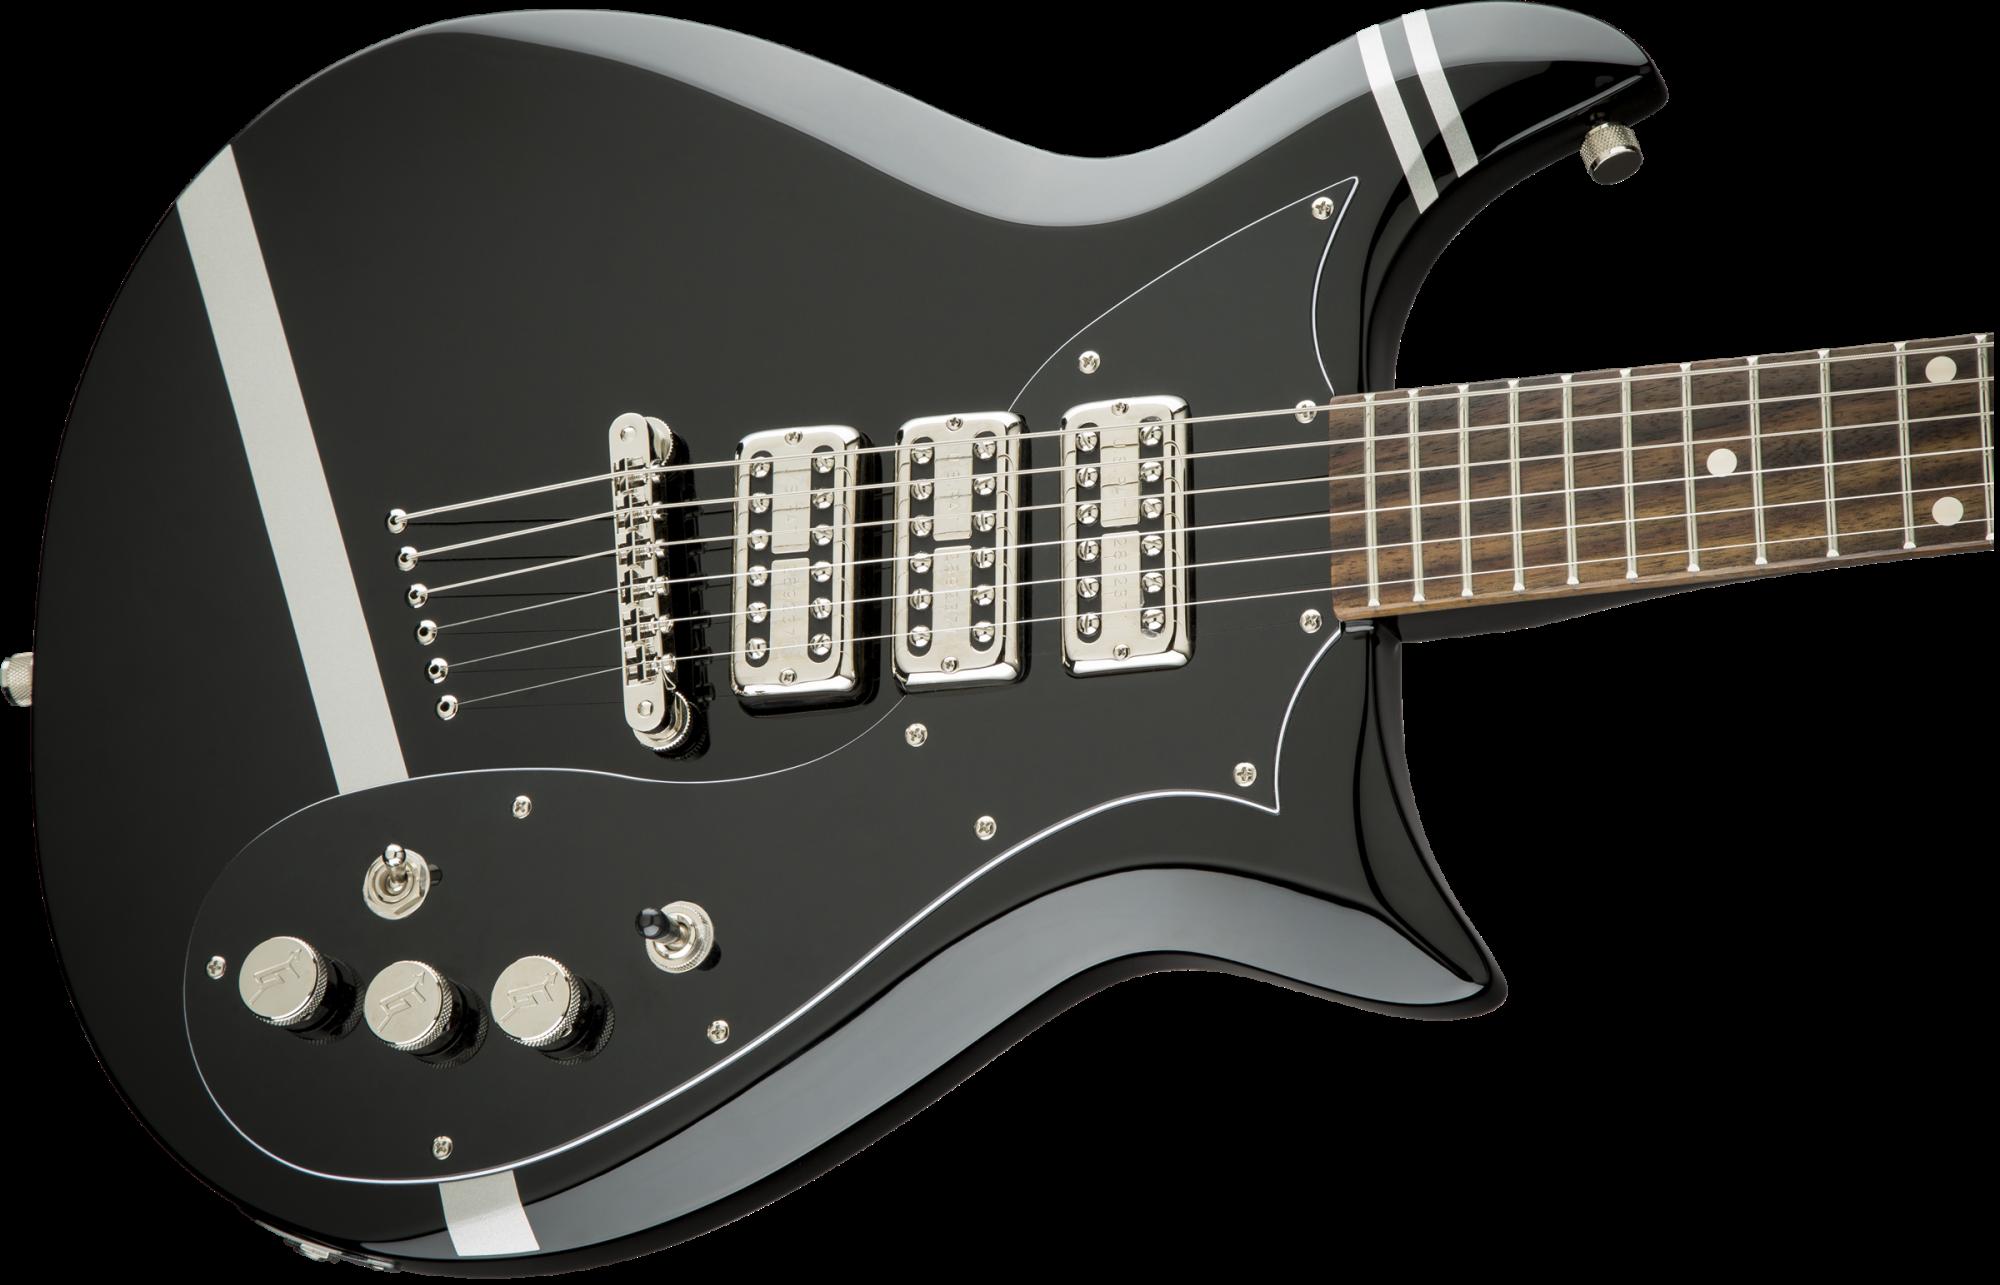 Gretsch G5135CVT-PS Patrick Stump Electromatic Stump-O-Matic CVT - Black with Pewter Stripes